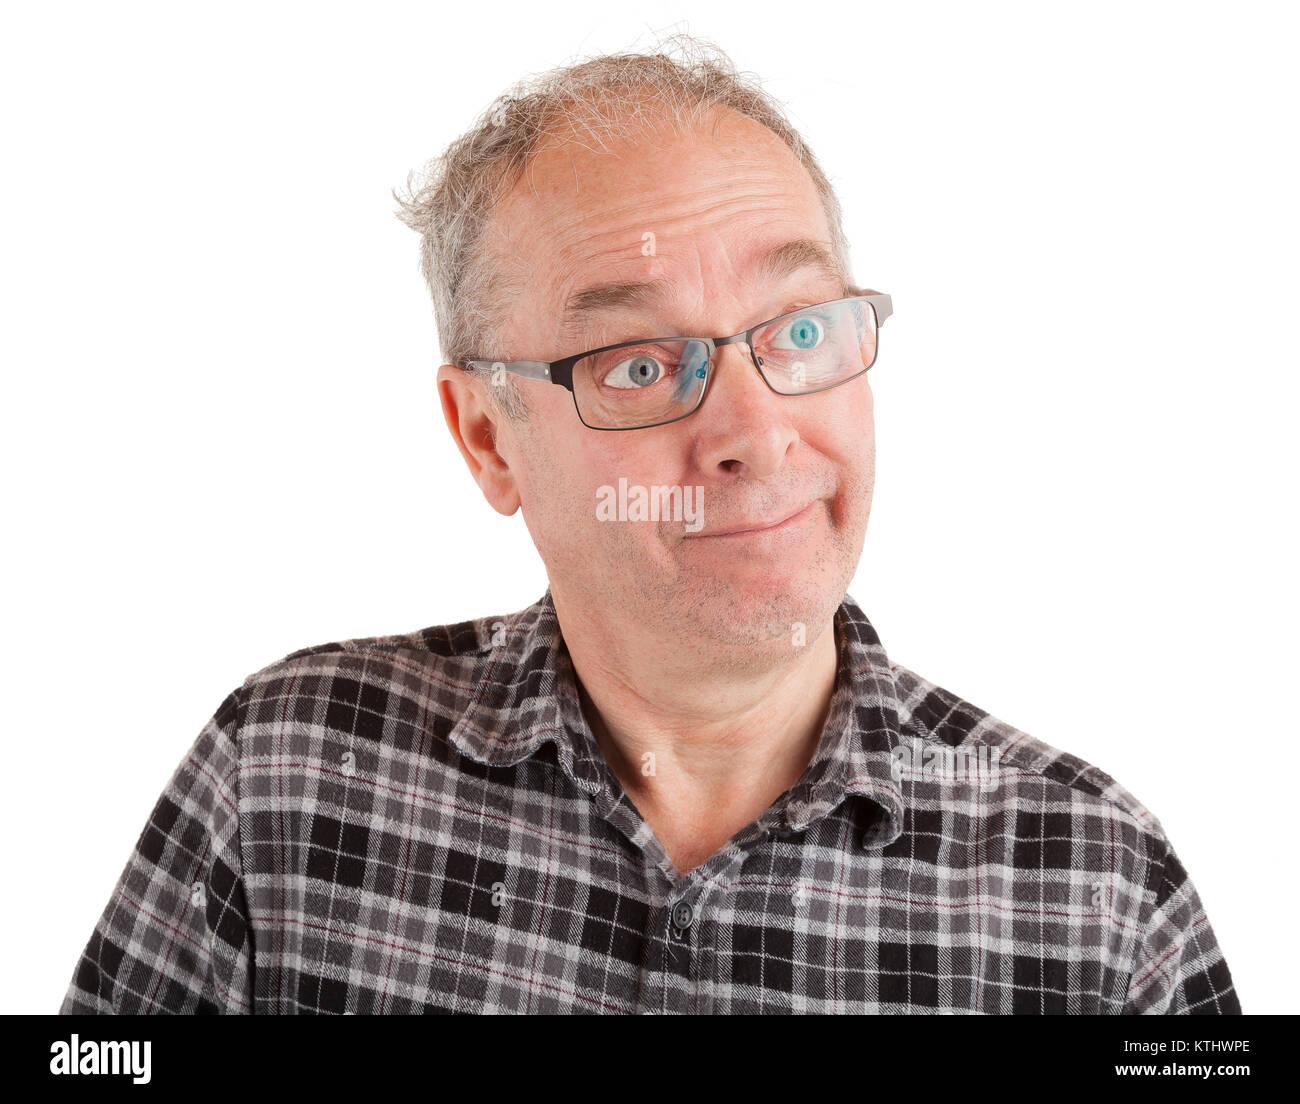 A man is joking and mocking someone. - Stock Image